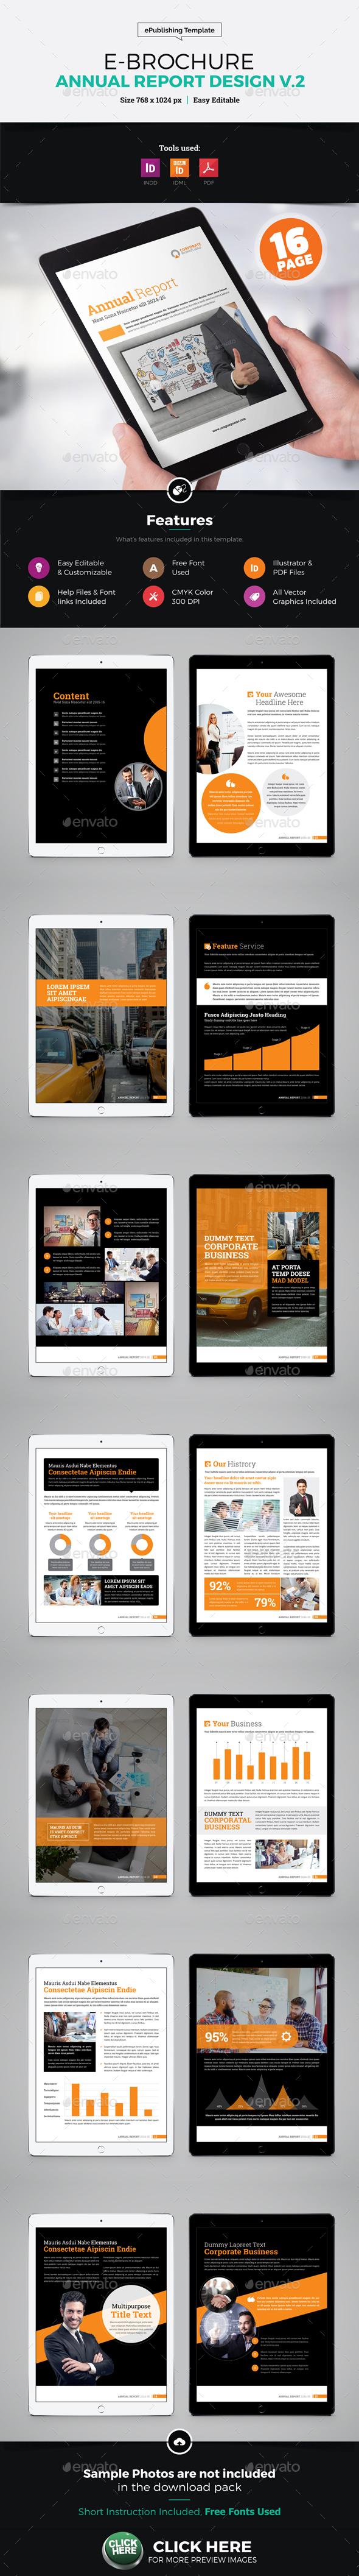 E-Brochure Annual Report Design v2 - Digital Books ePublishing